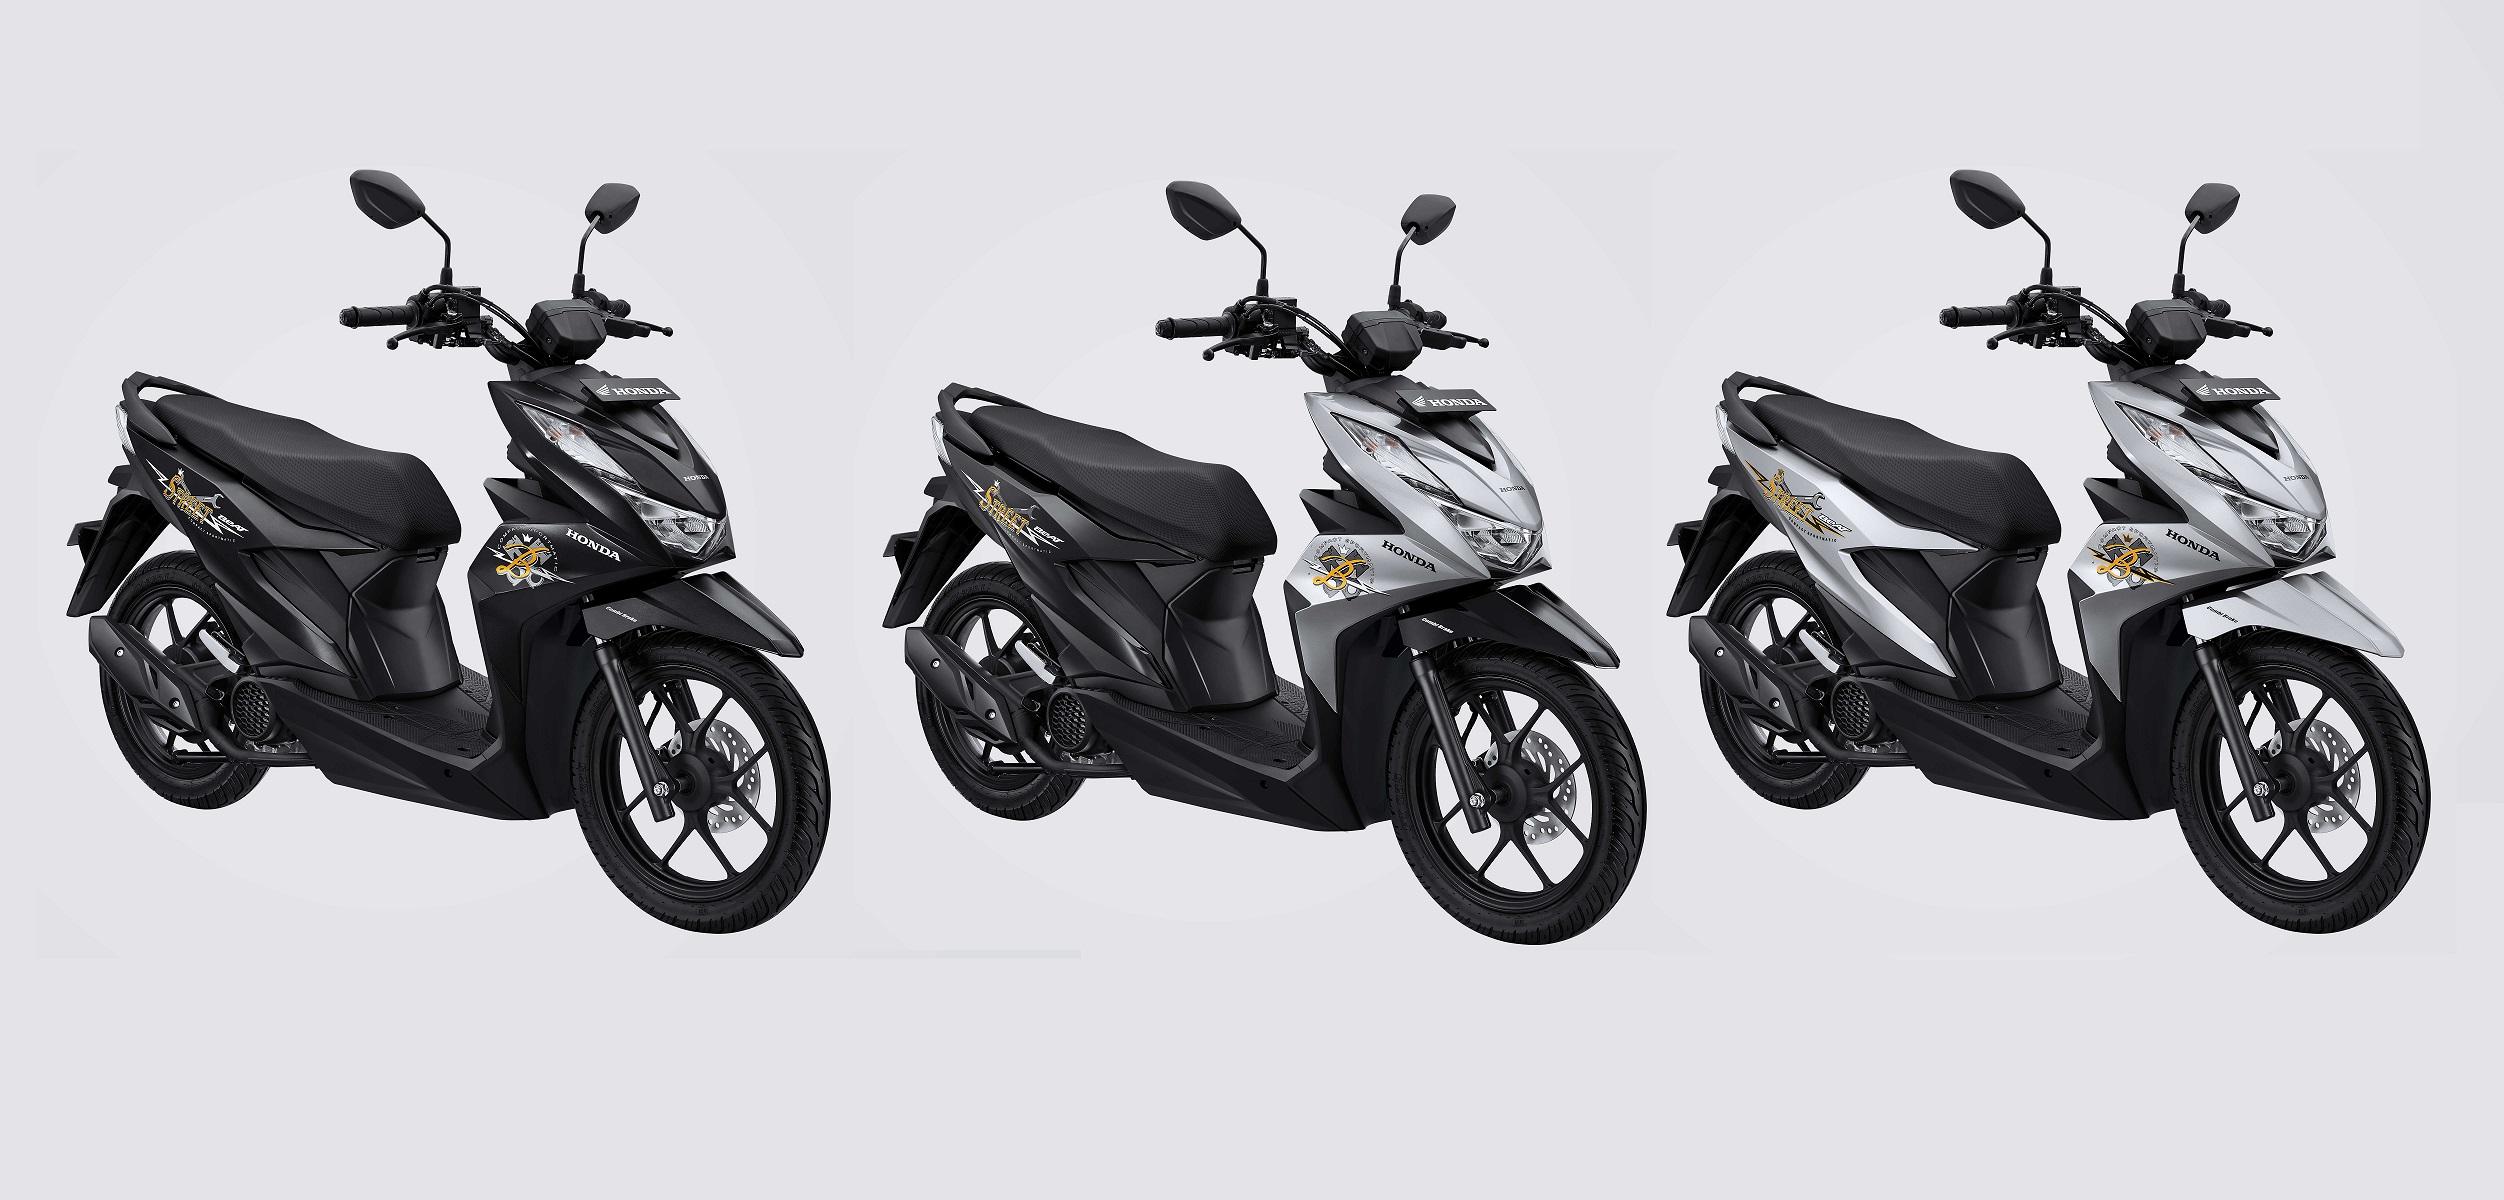 Honda Beat Hadir Desain Baru Dan Teknologi Melimpah Apa Hebatnya